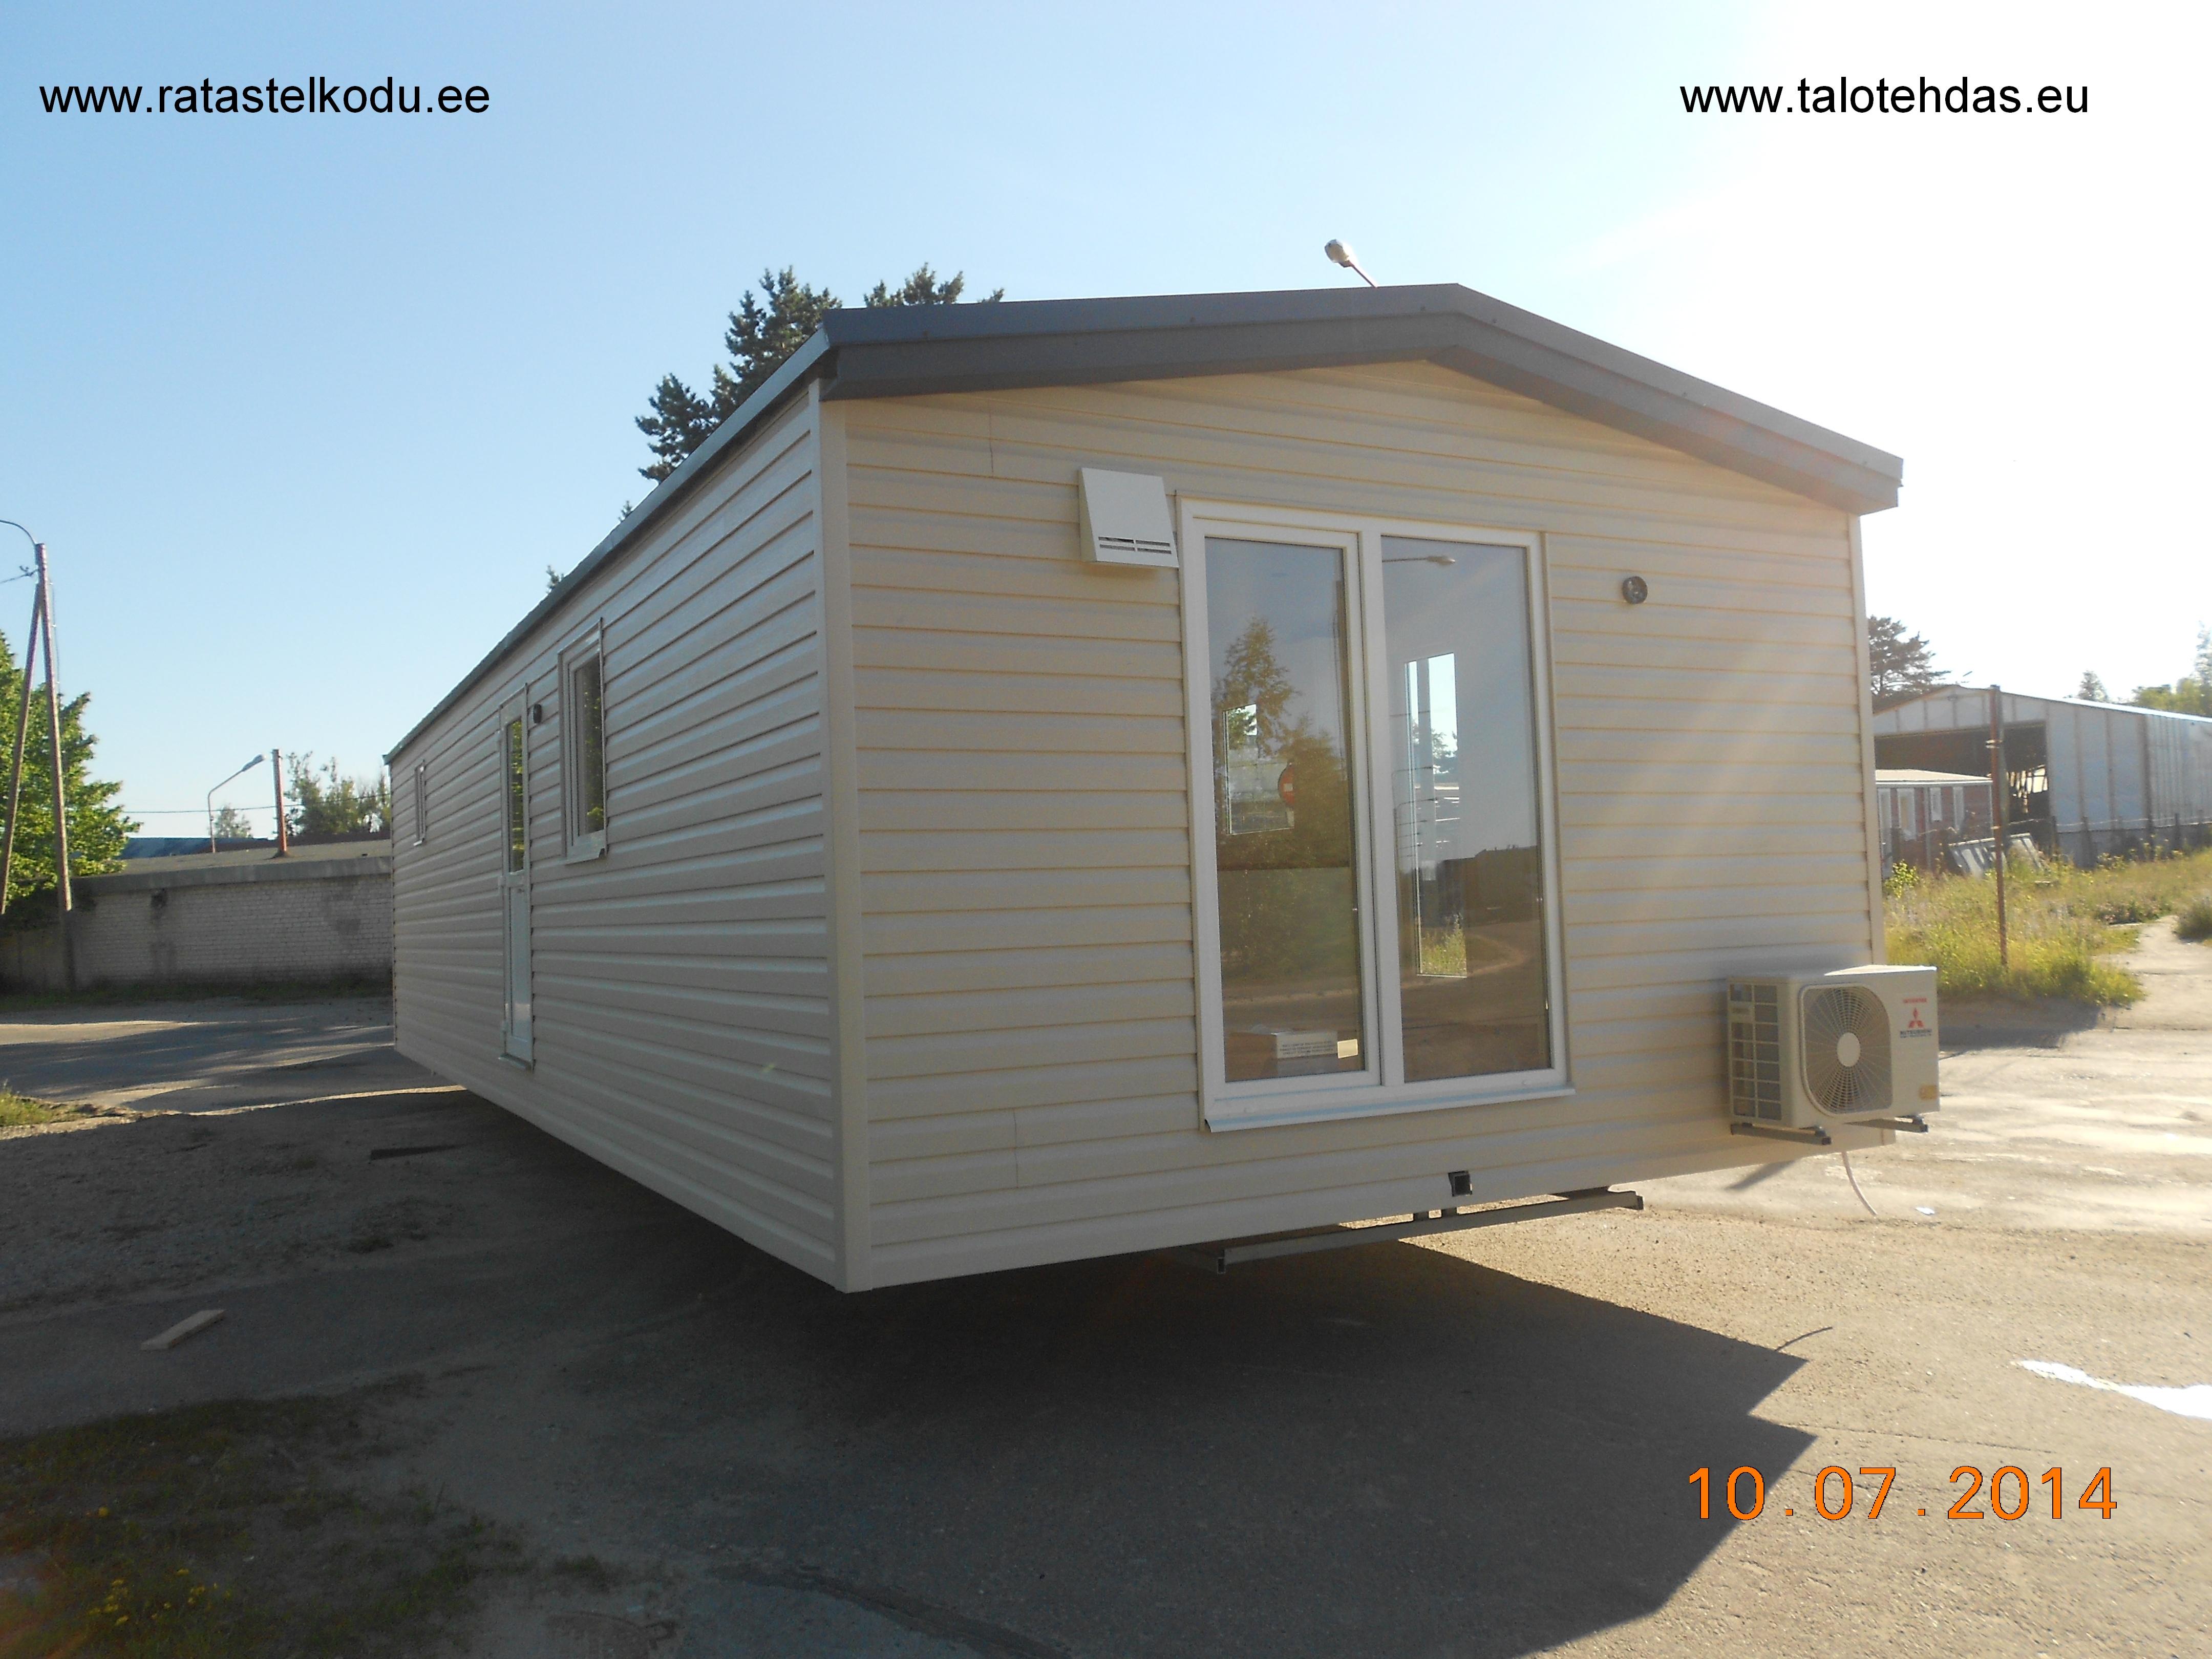 Husvogner, mobile homes, facade plastic, length 12m, width 4,3m, height from ground 3,5m